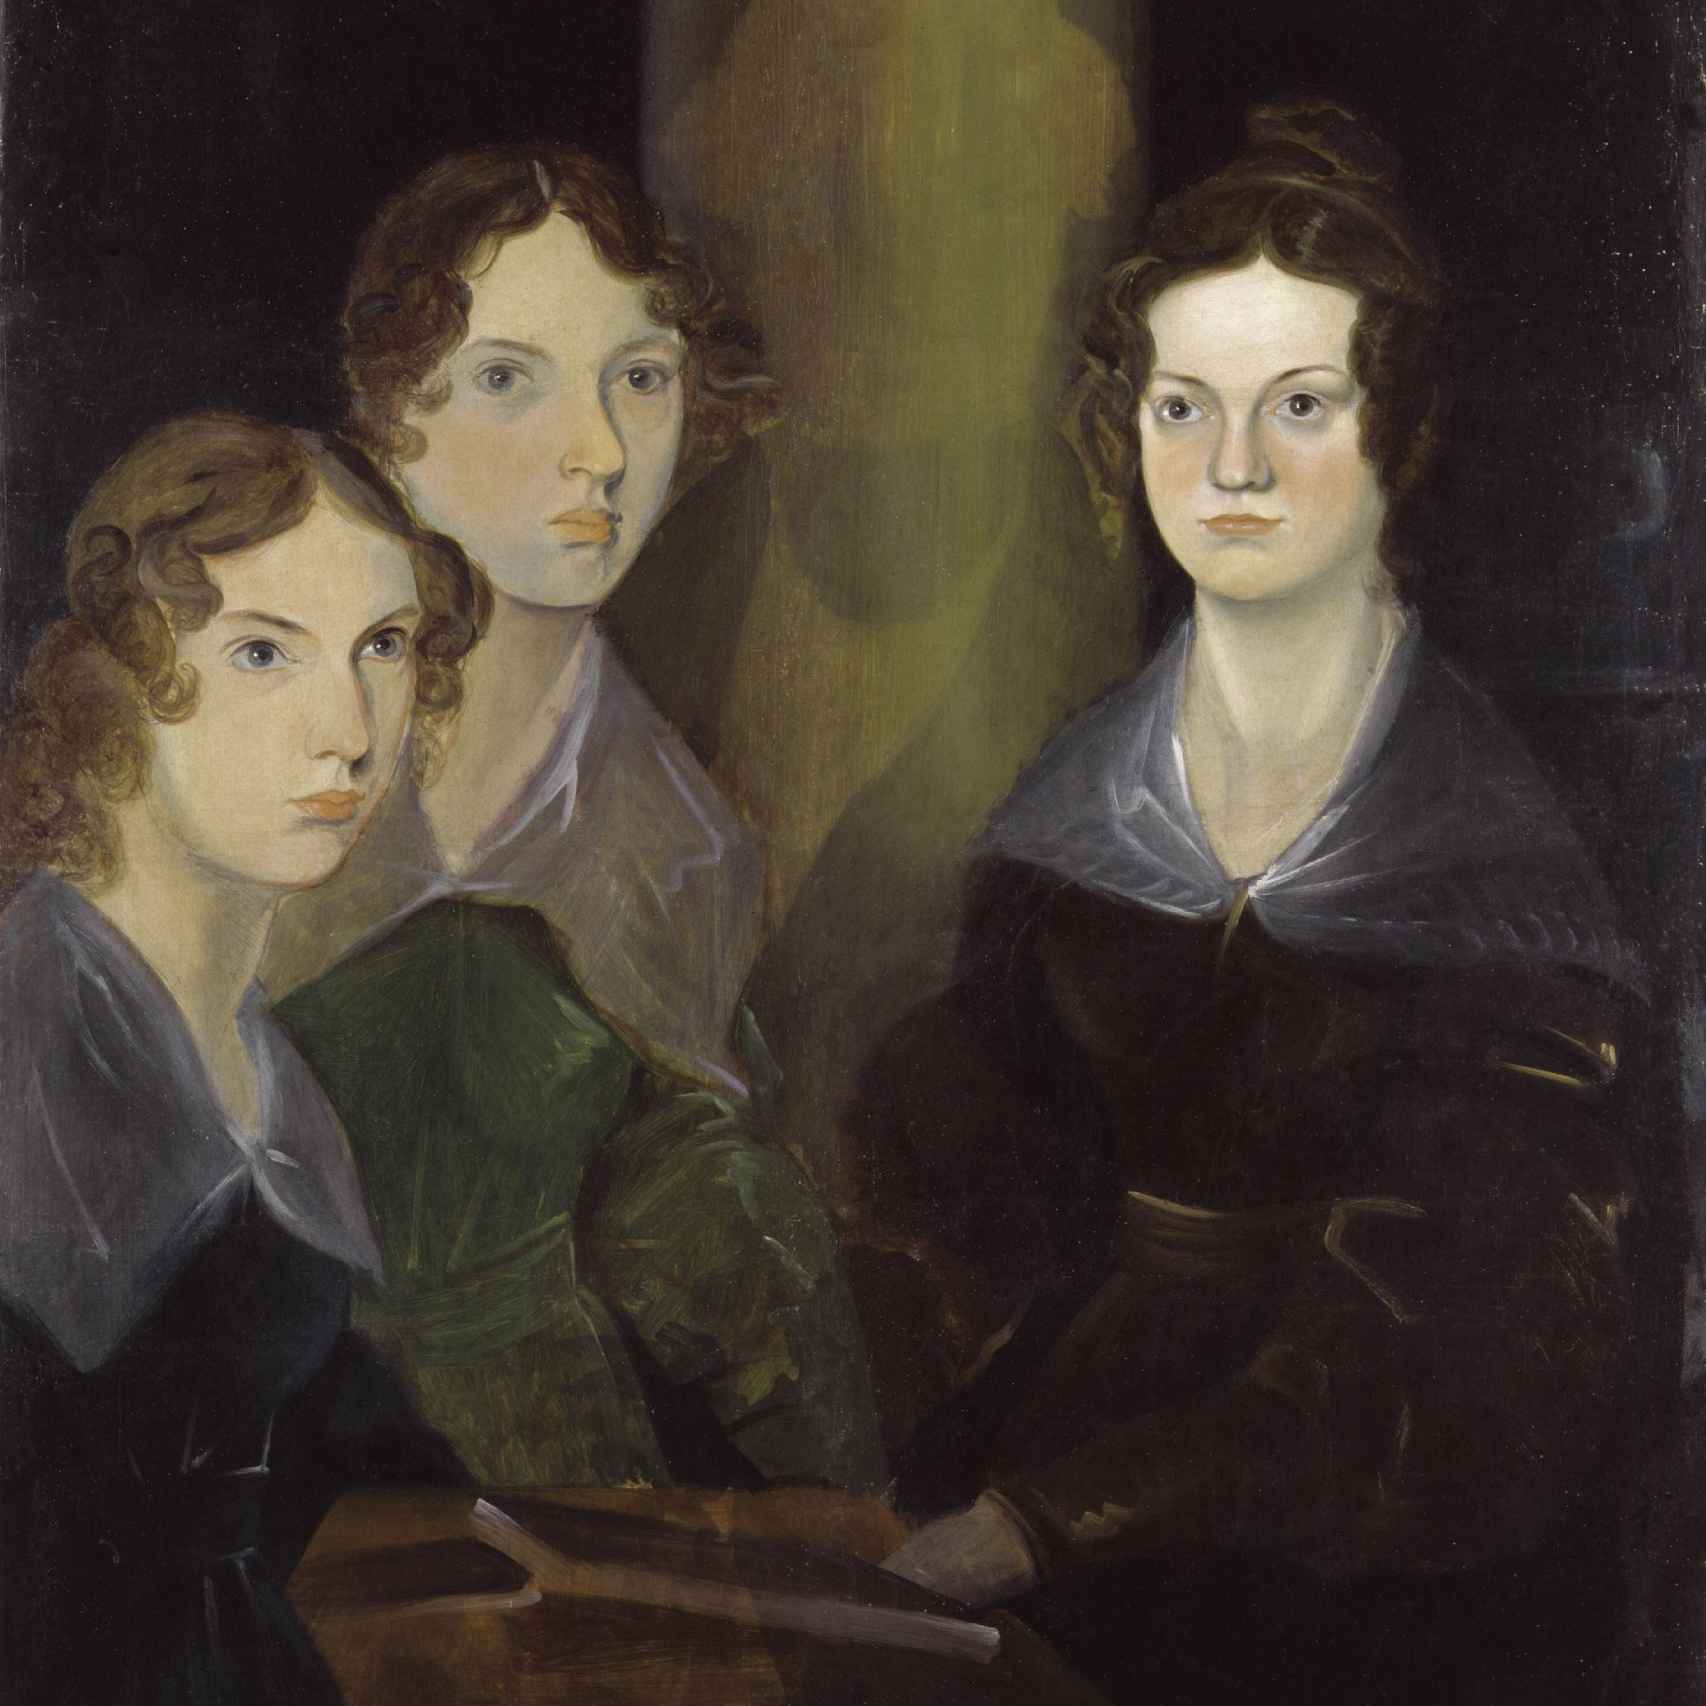 Las hermanas Bronte.